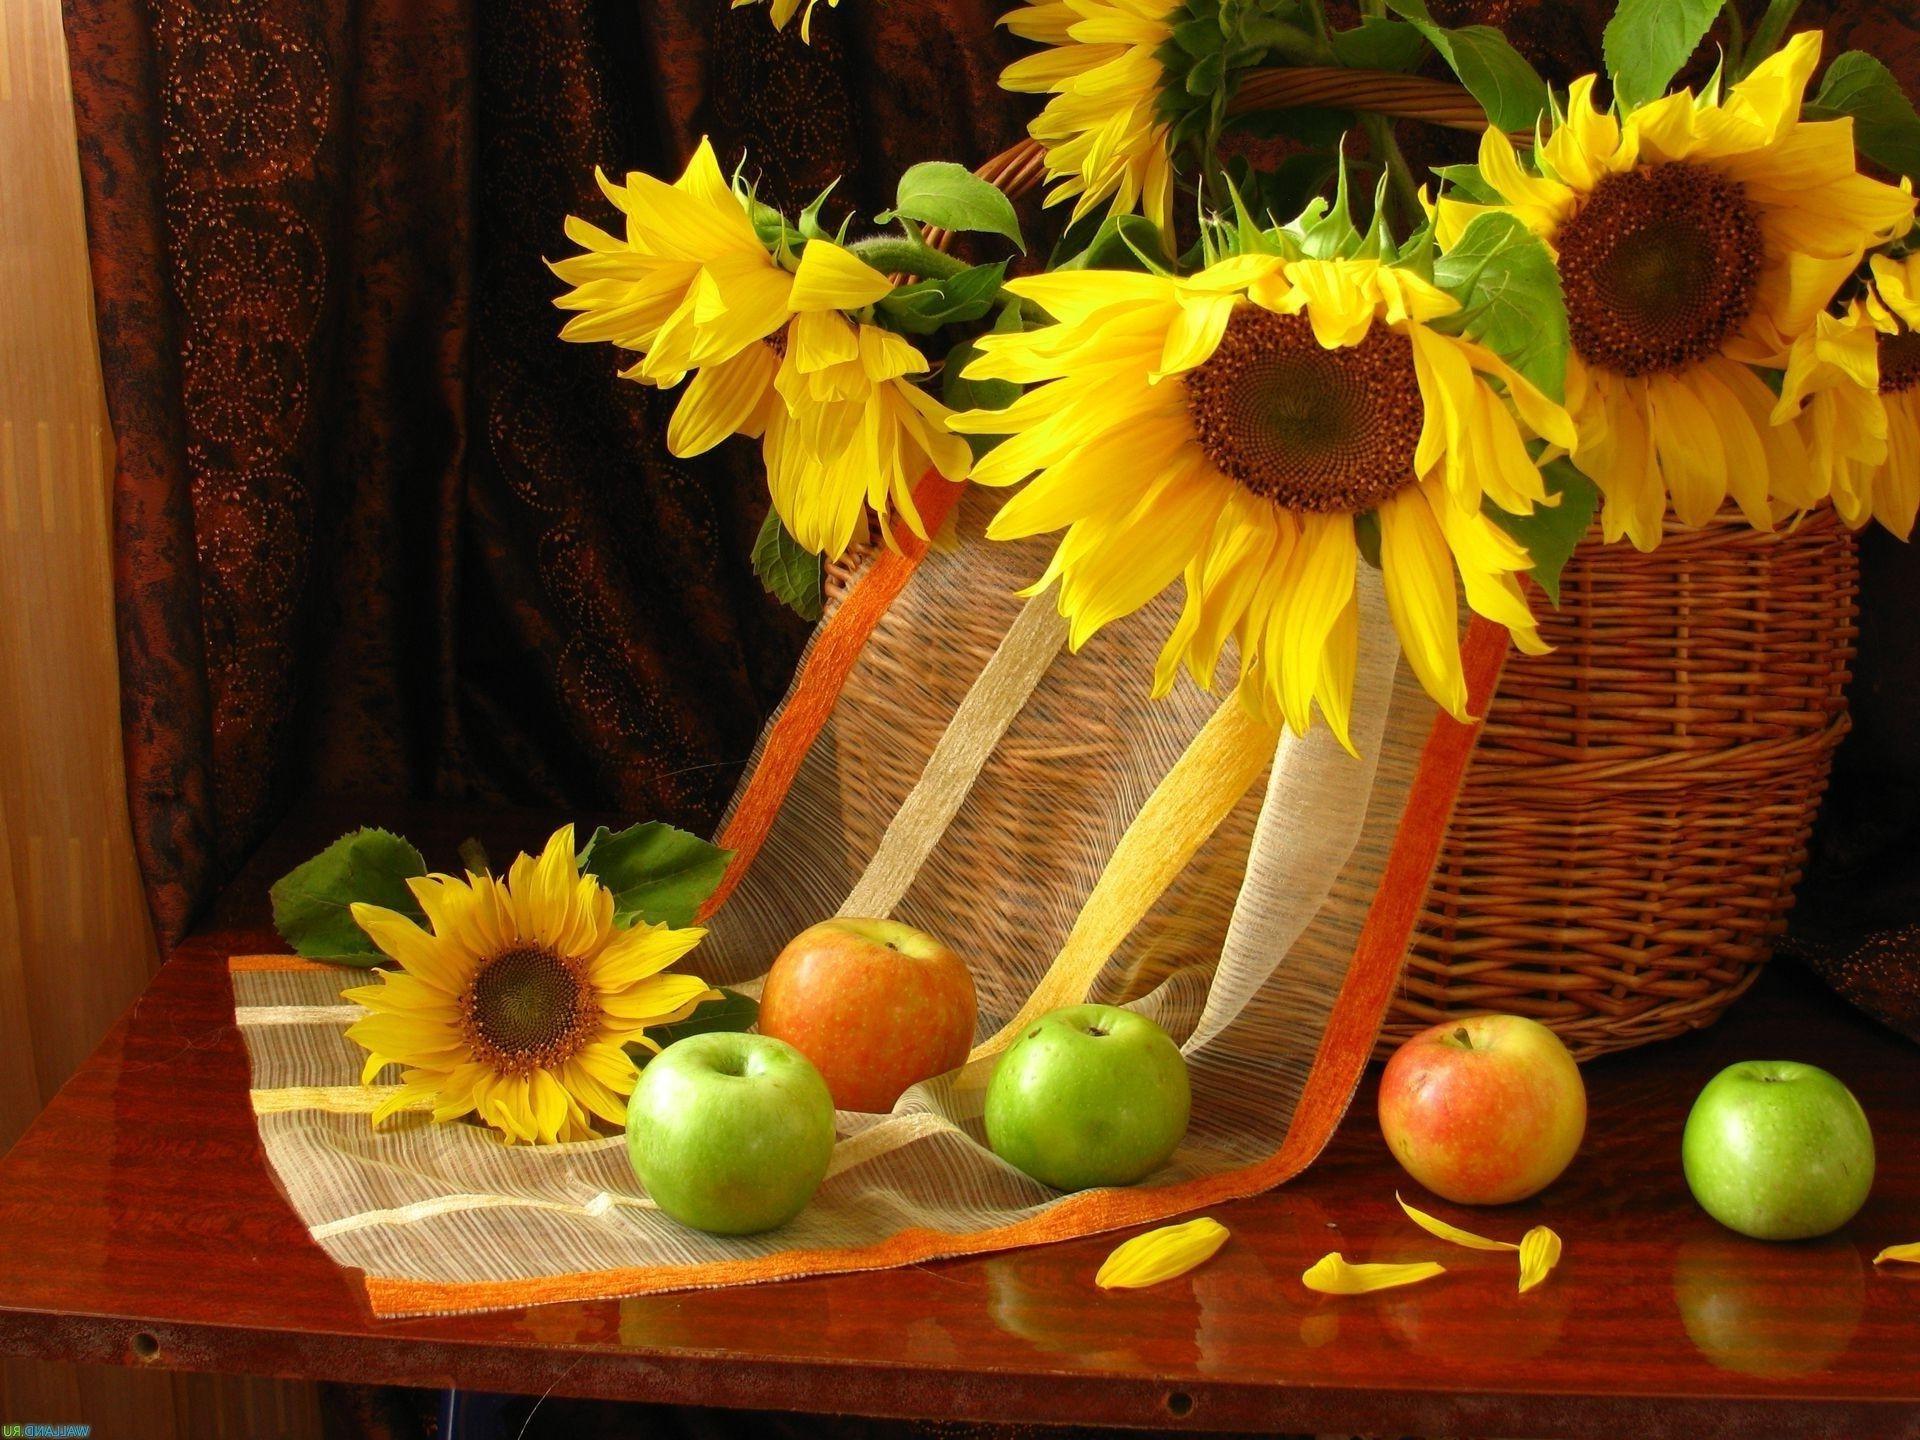 Flowers Apples Still Life Petals Fruit Sunflowers Phone